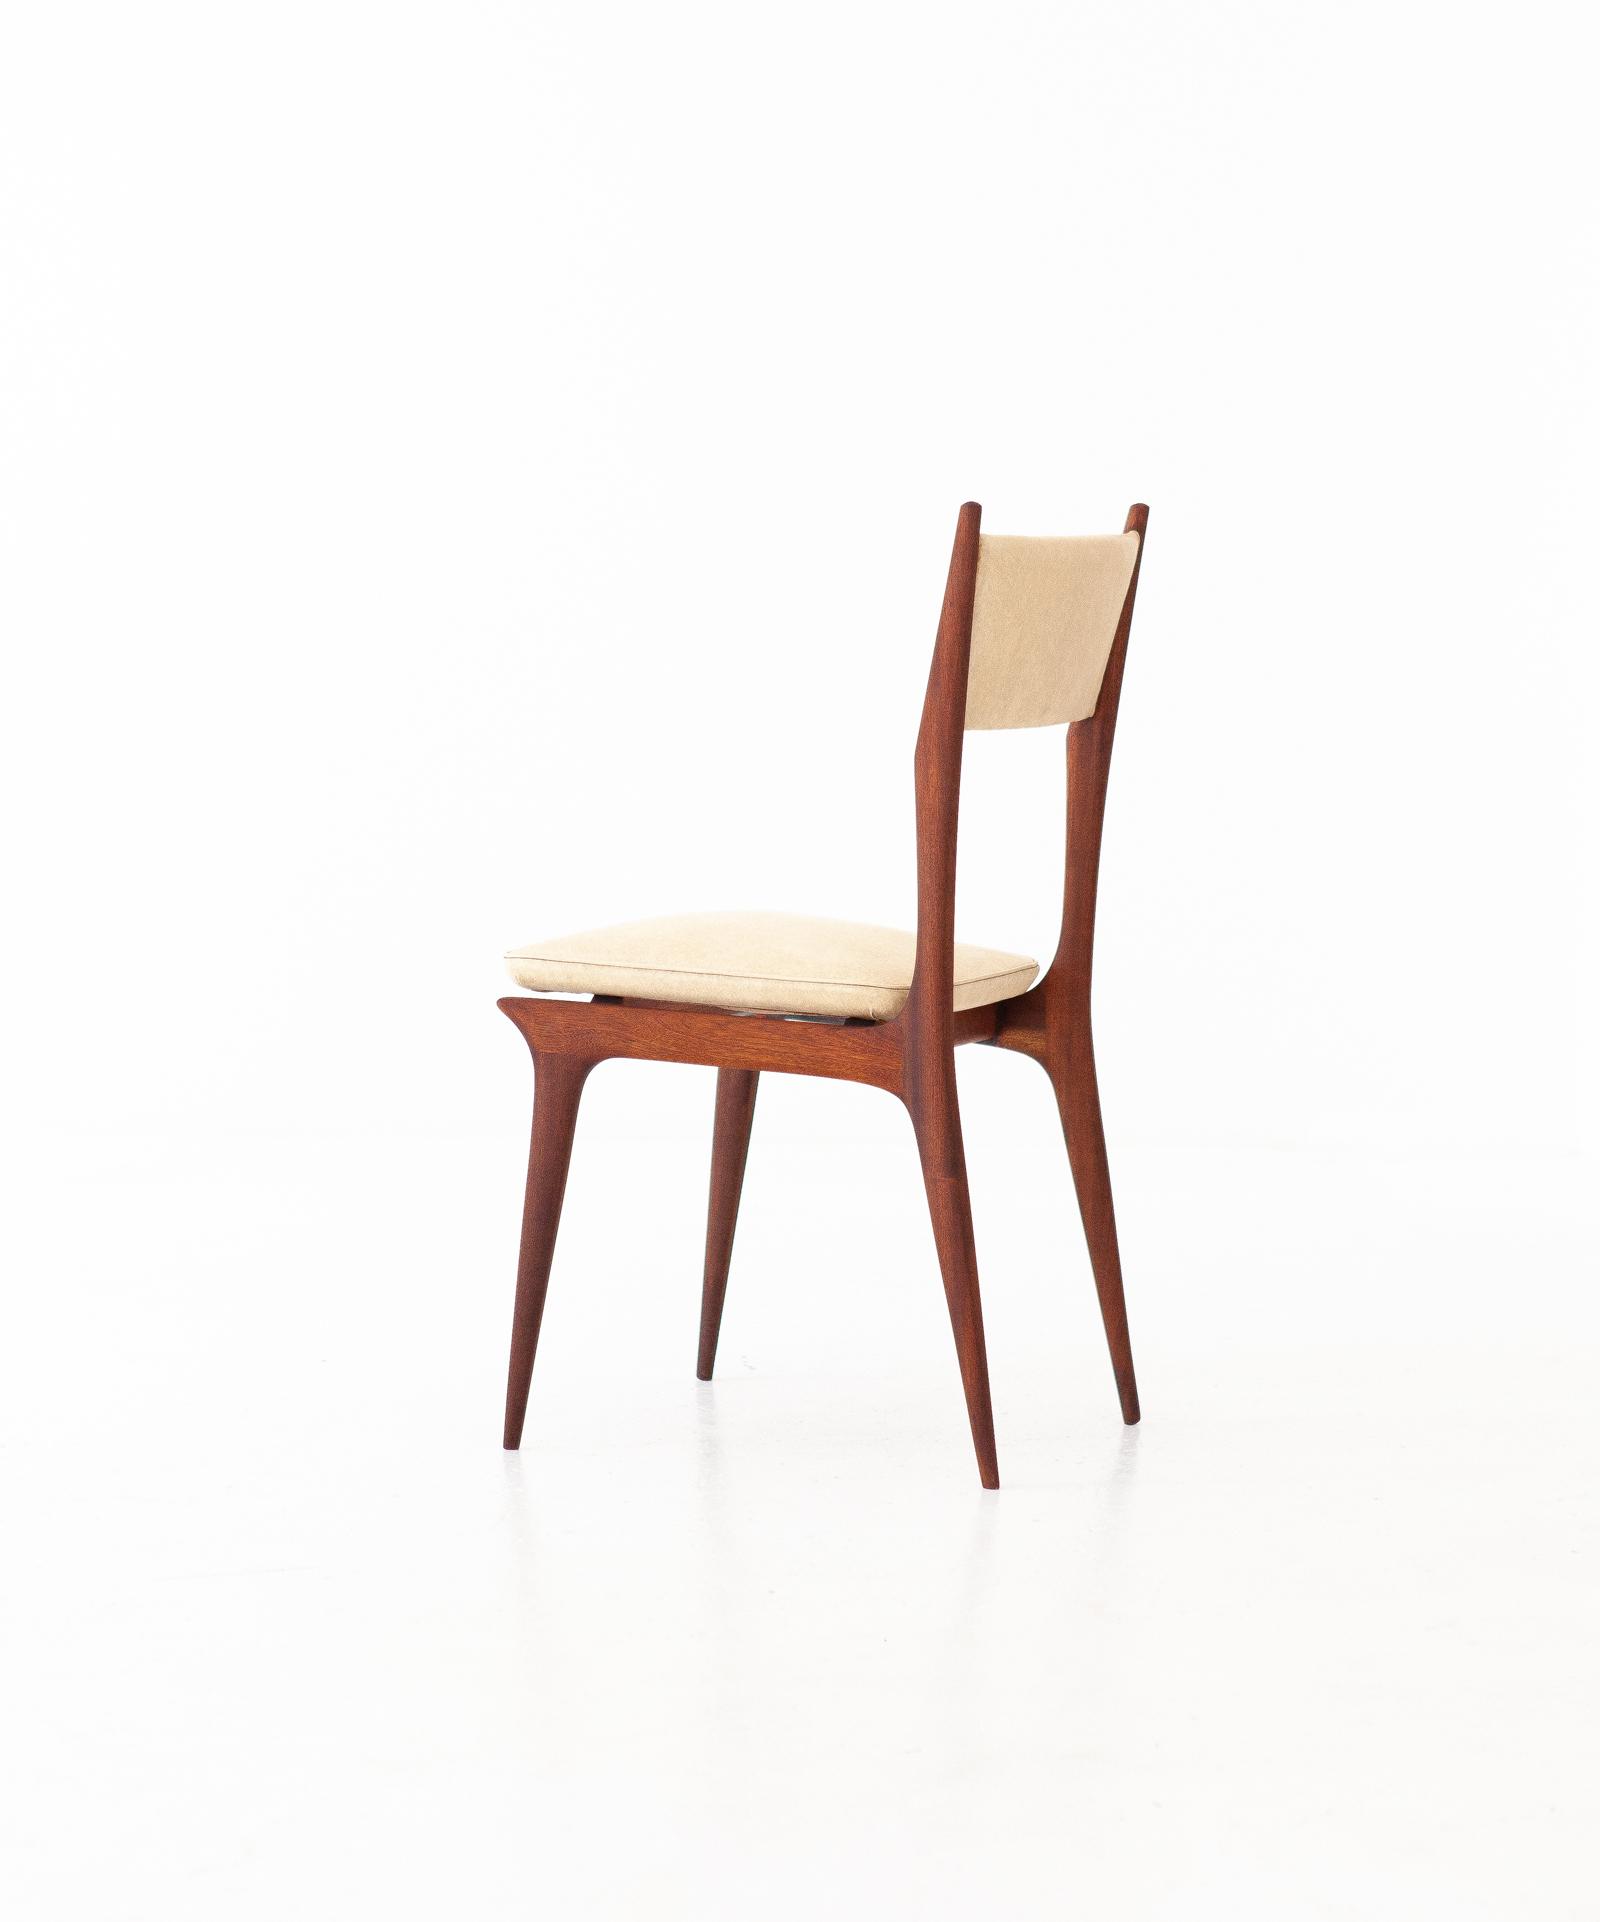 six-italian-mahogany-beige-skai-dining-chairs-8-SE281